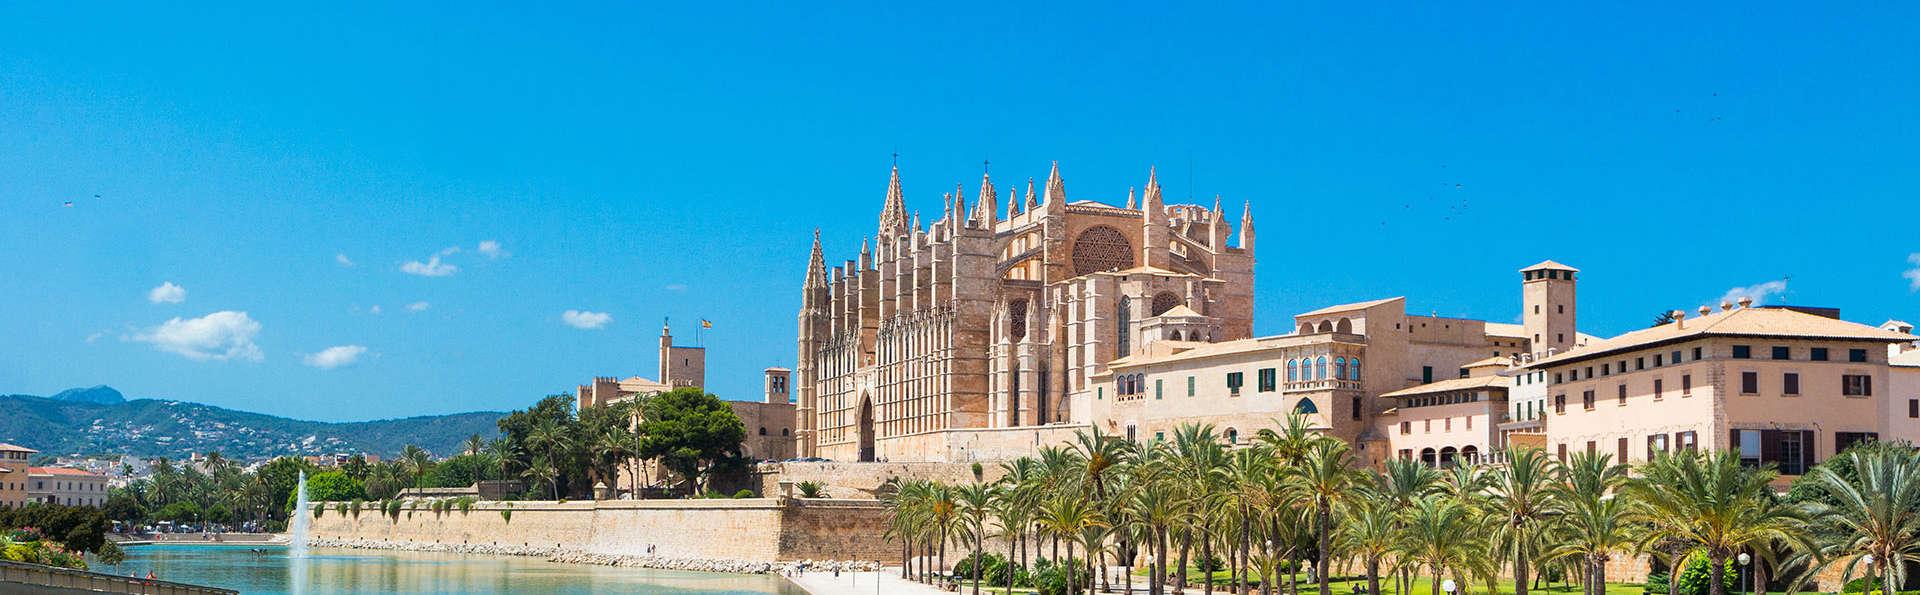 Pierre & Vacances Mallorca Deya - EDIT_DESTINATION_02.jpg